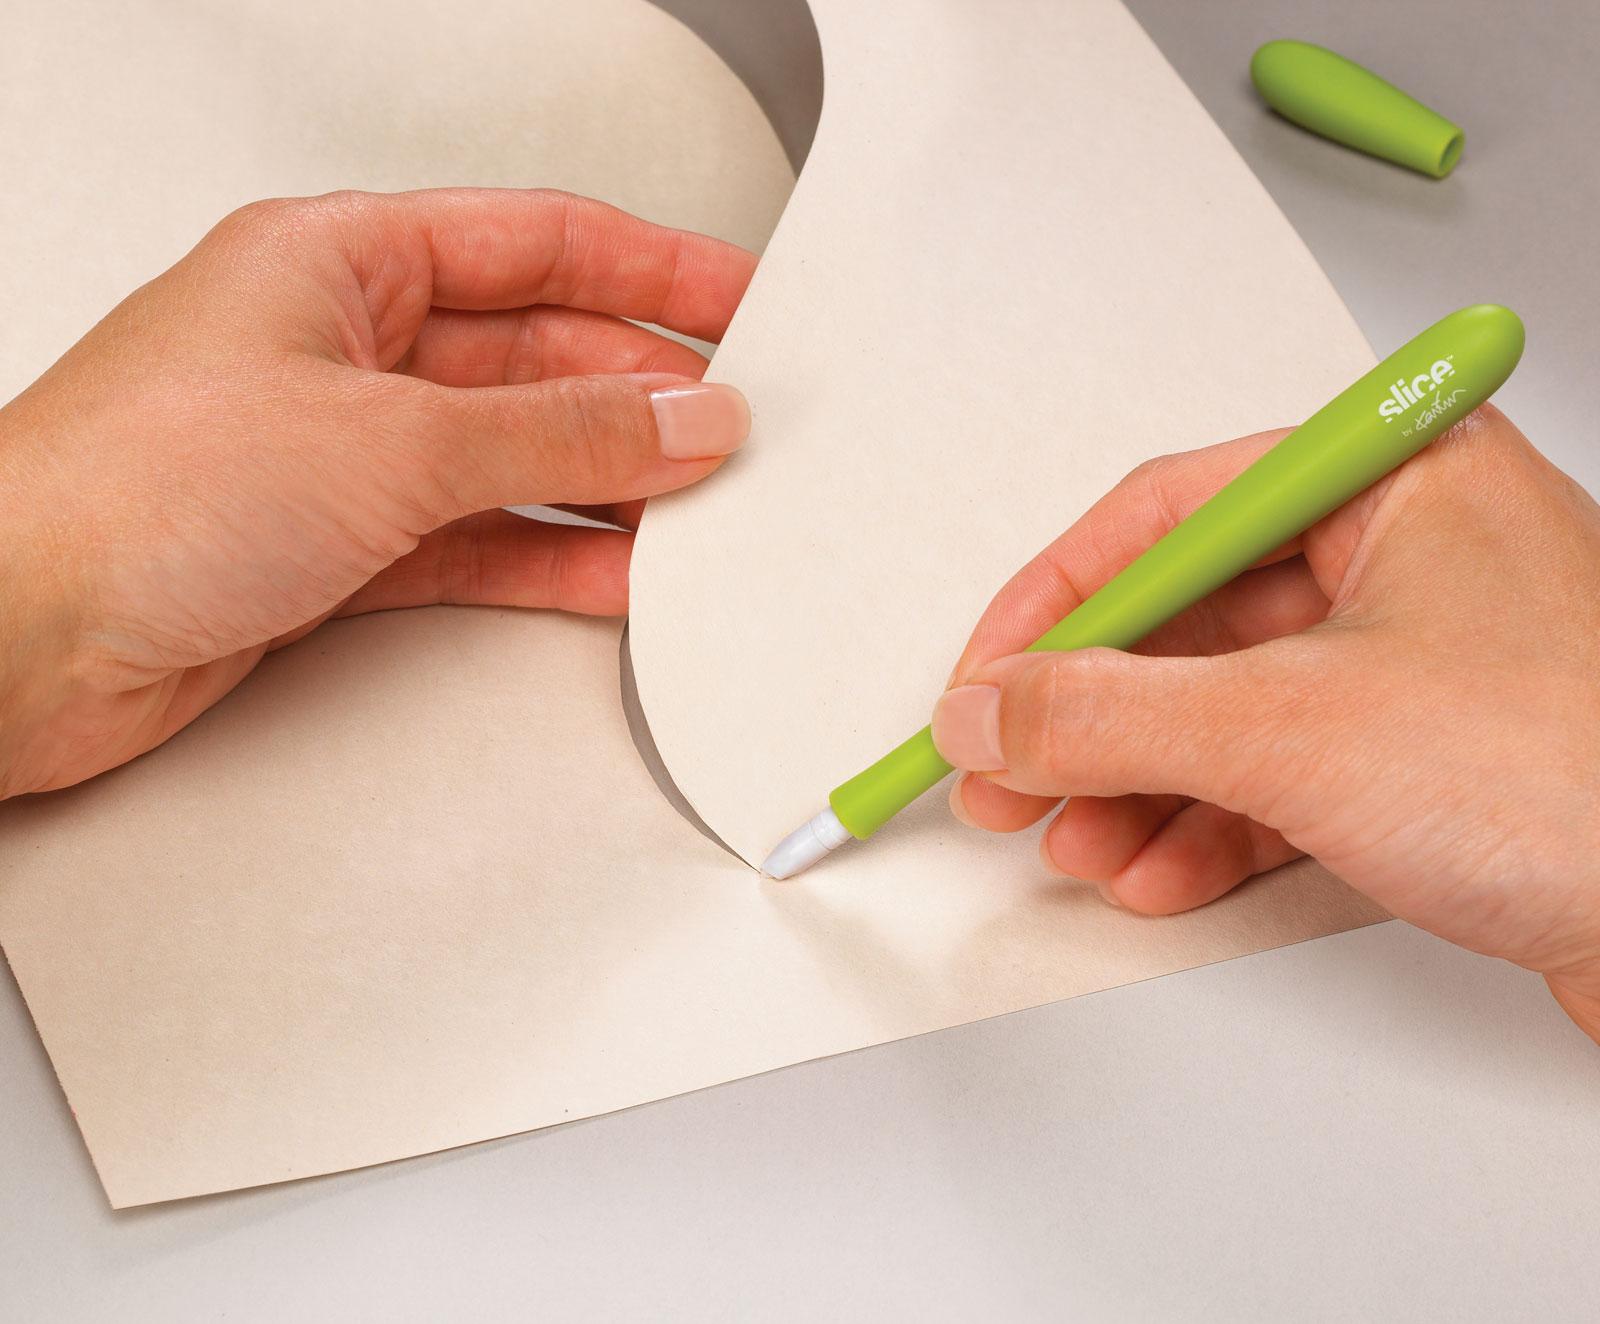 Skalpell-Keramik-Bestelmesser-Präzisionsschneider-Slice-Kurvenschnitt-CURT-tools